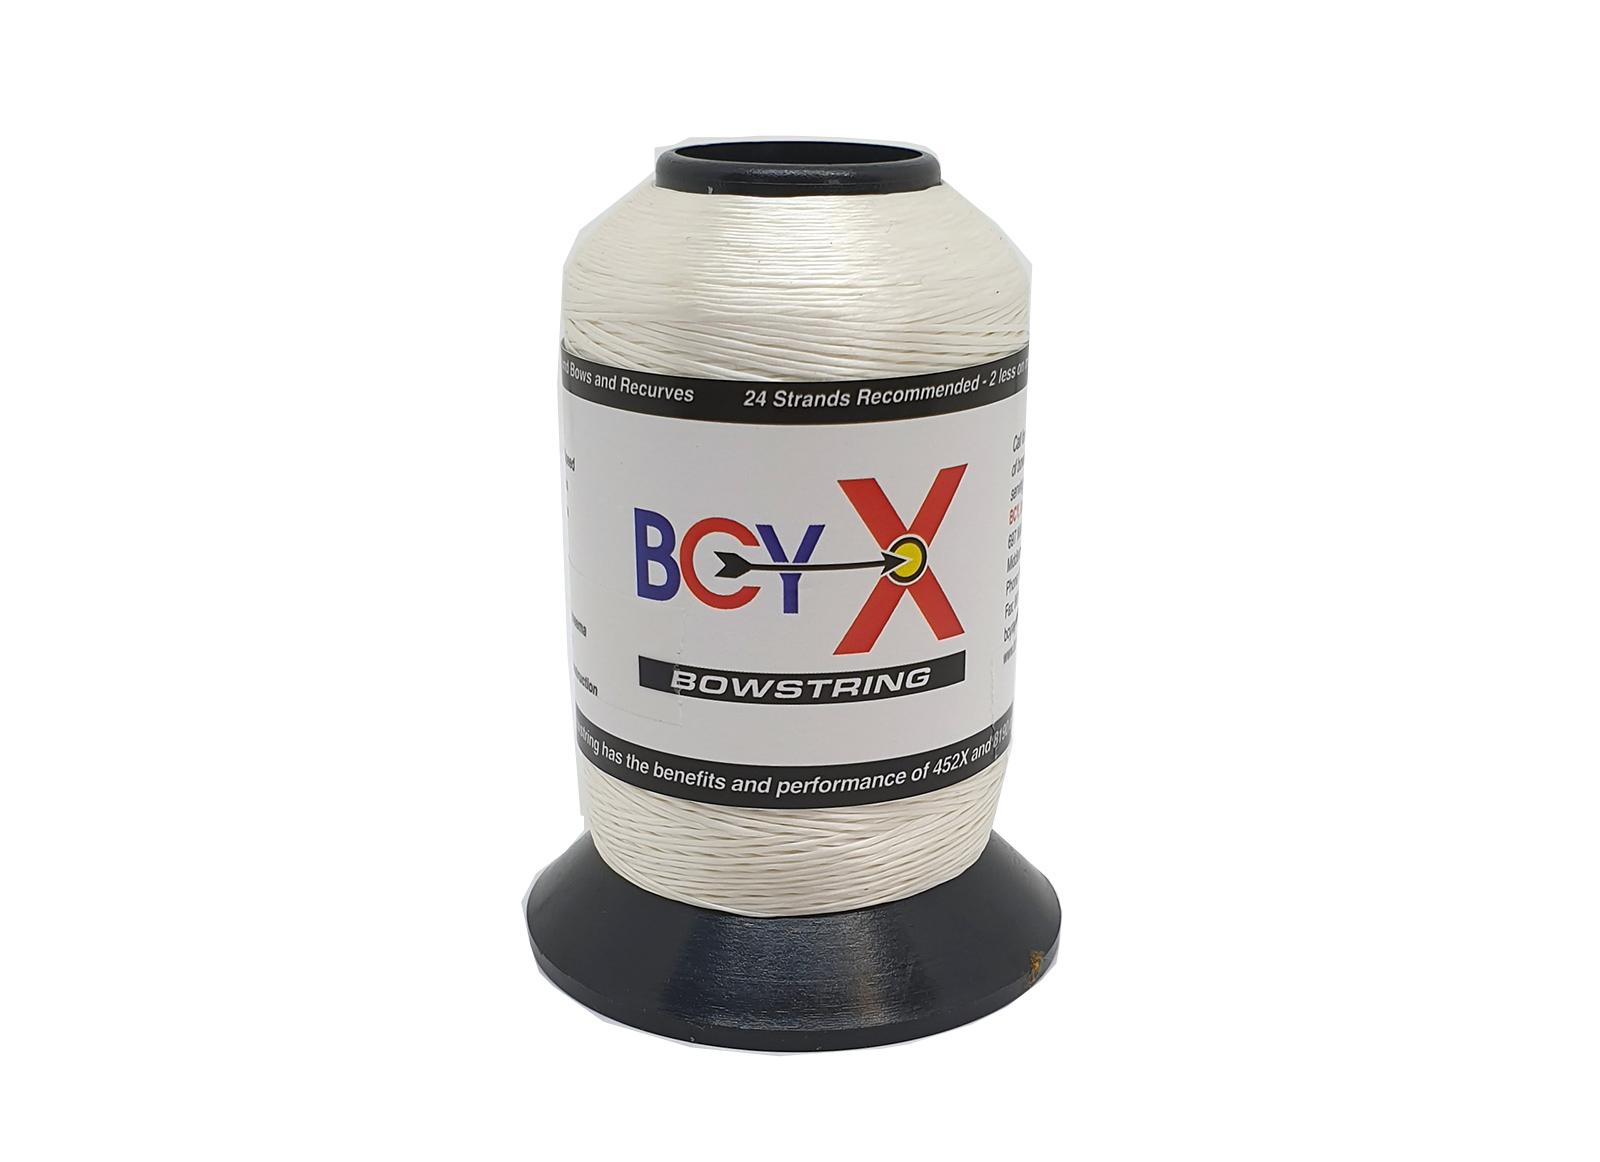 BCY FILATO PER CORDE BCY-X UNIVERSAL 1/8 WHITE